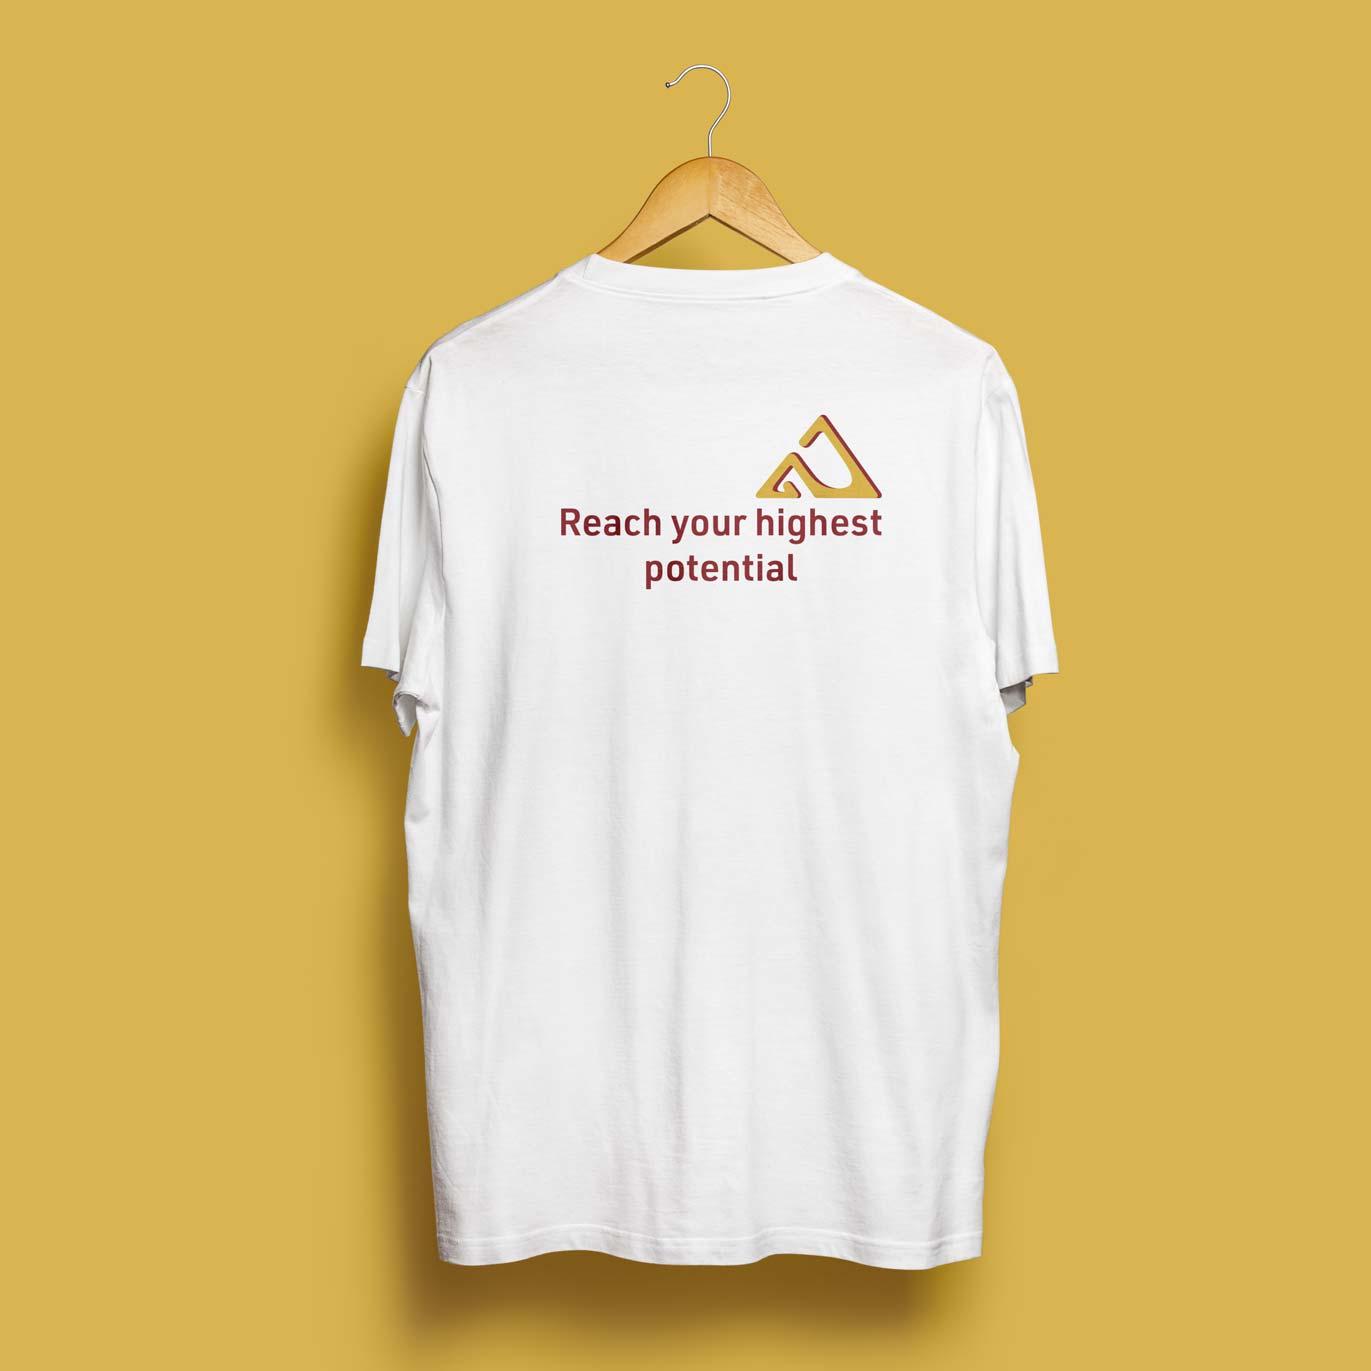 T-shirt and Logo design for Gold Summit Tutoring by Alina Demidova